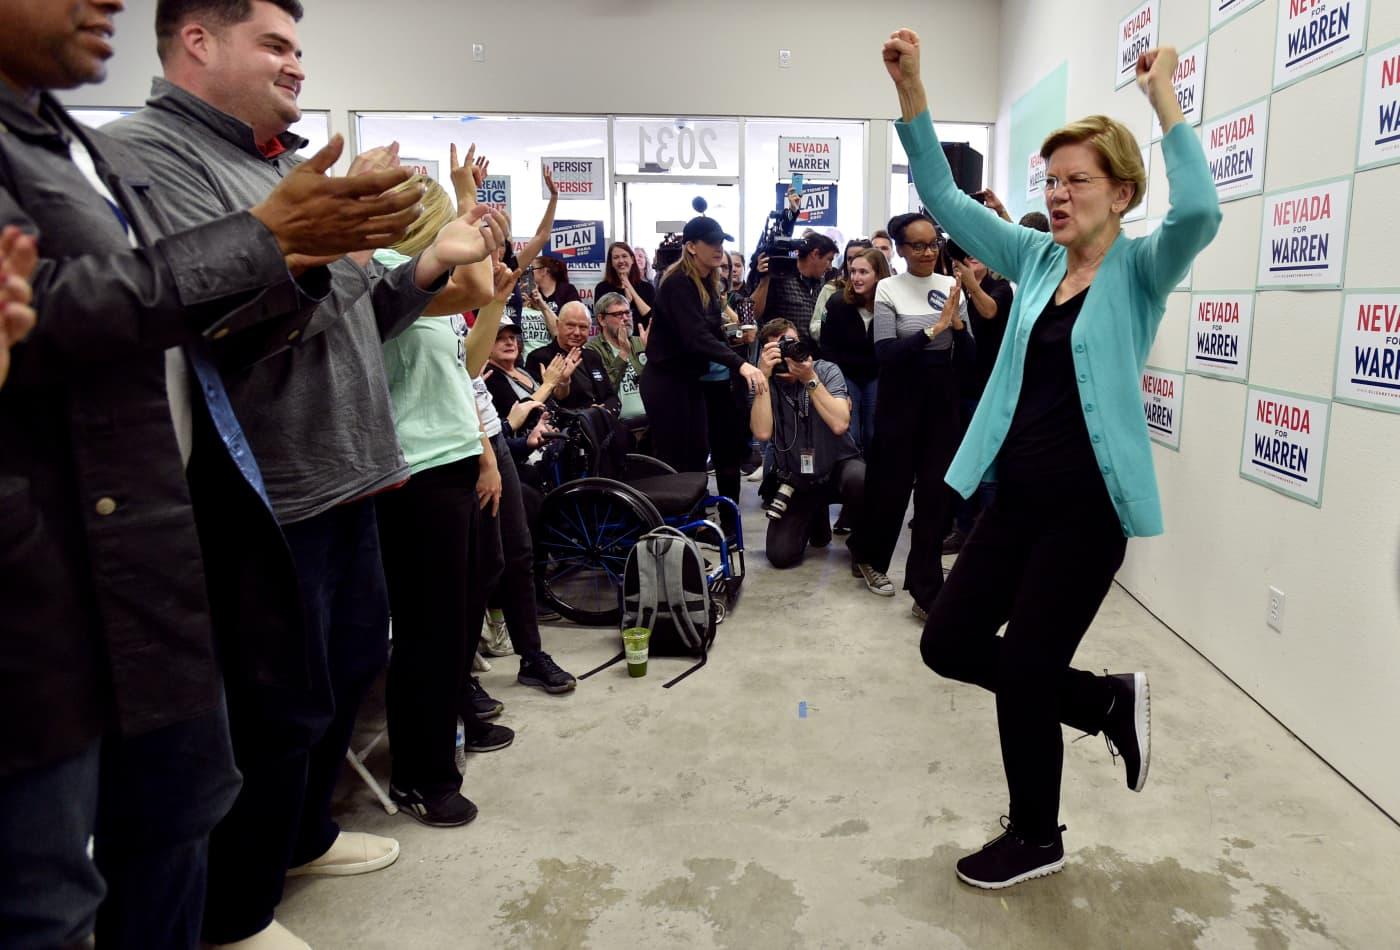 Elizabeth Warren reverses her position on super PAC support as she seeks comeback